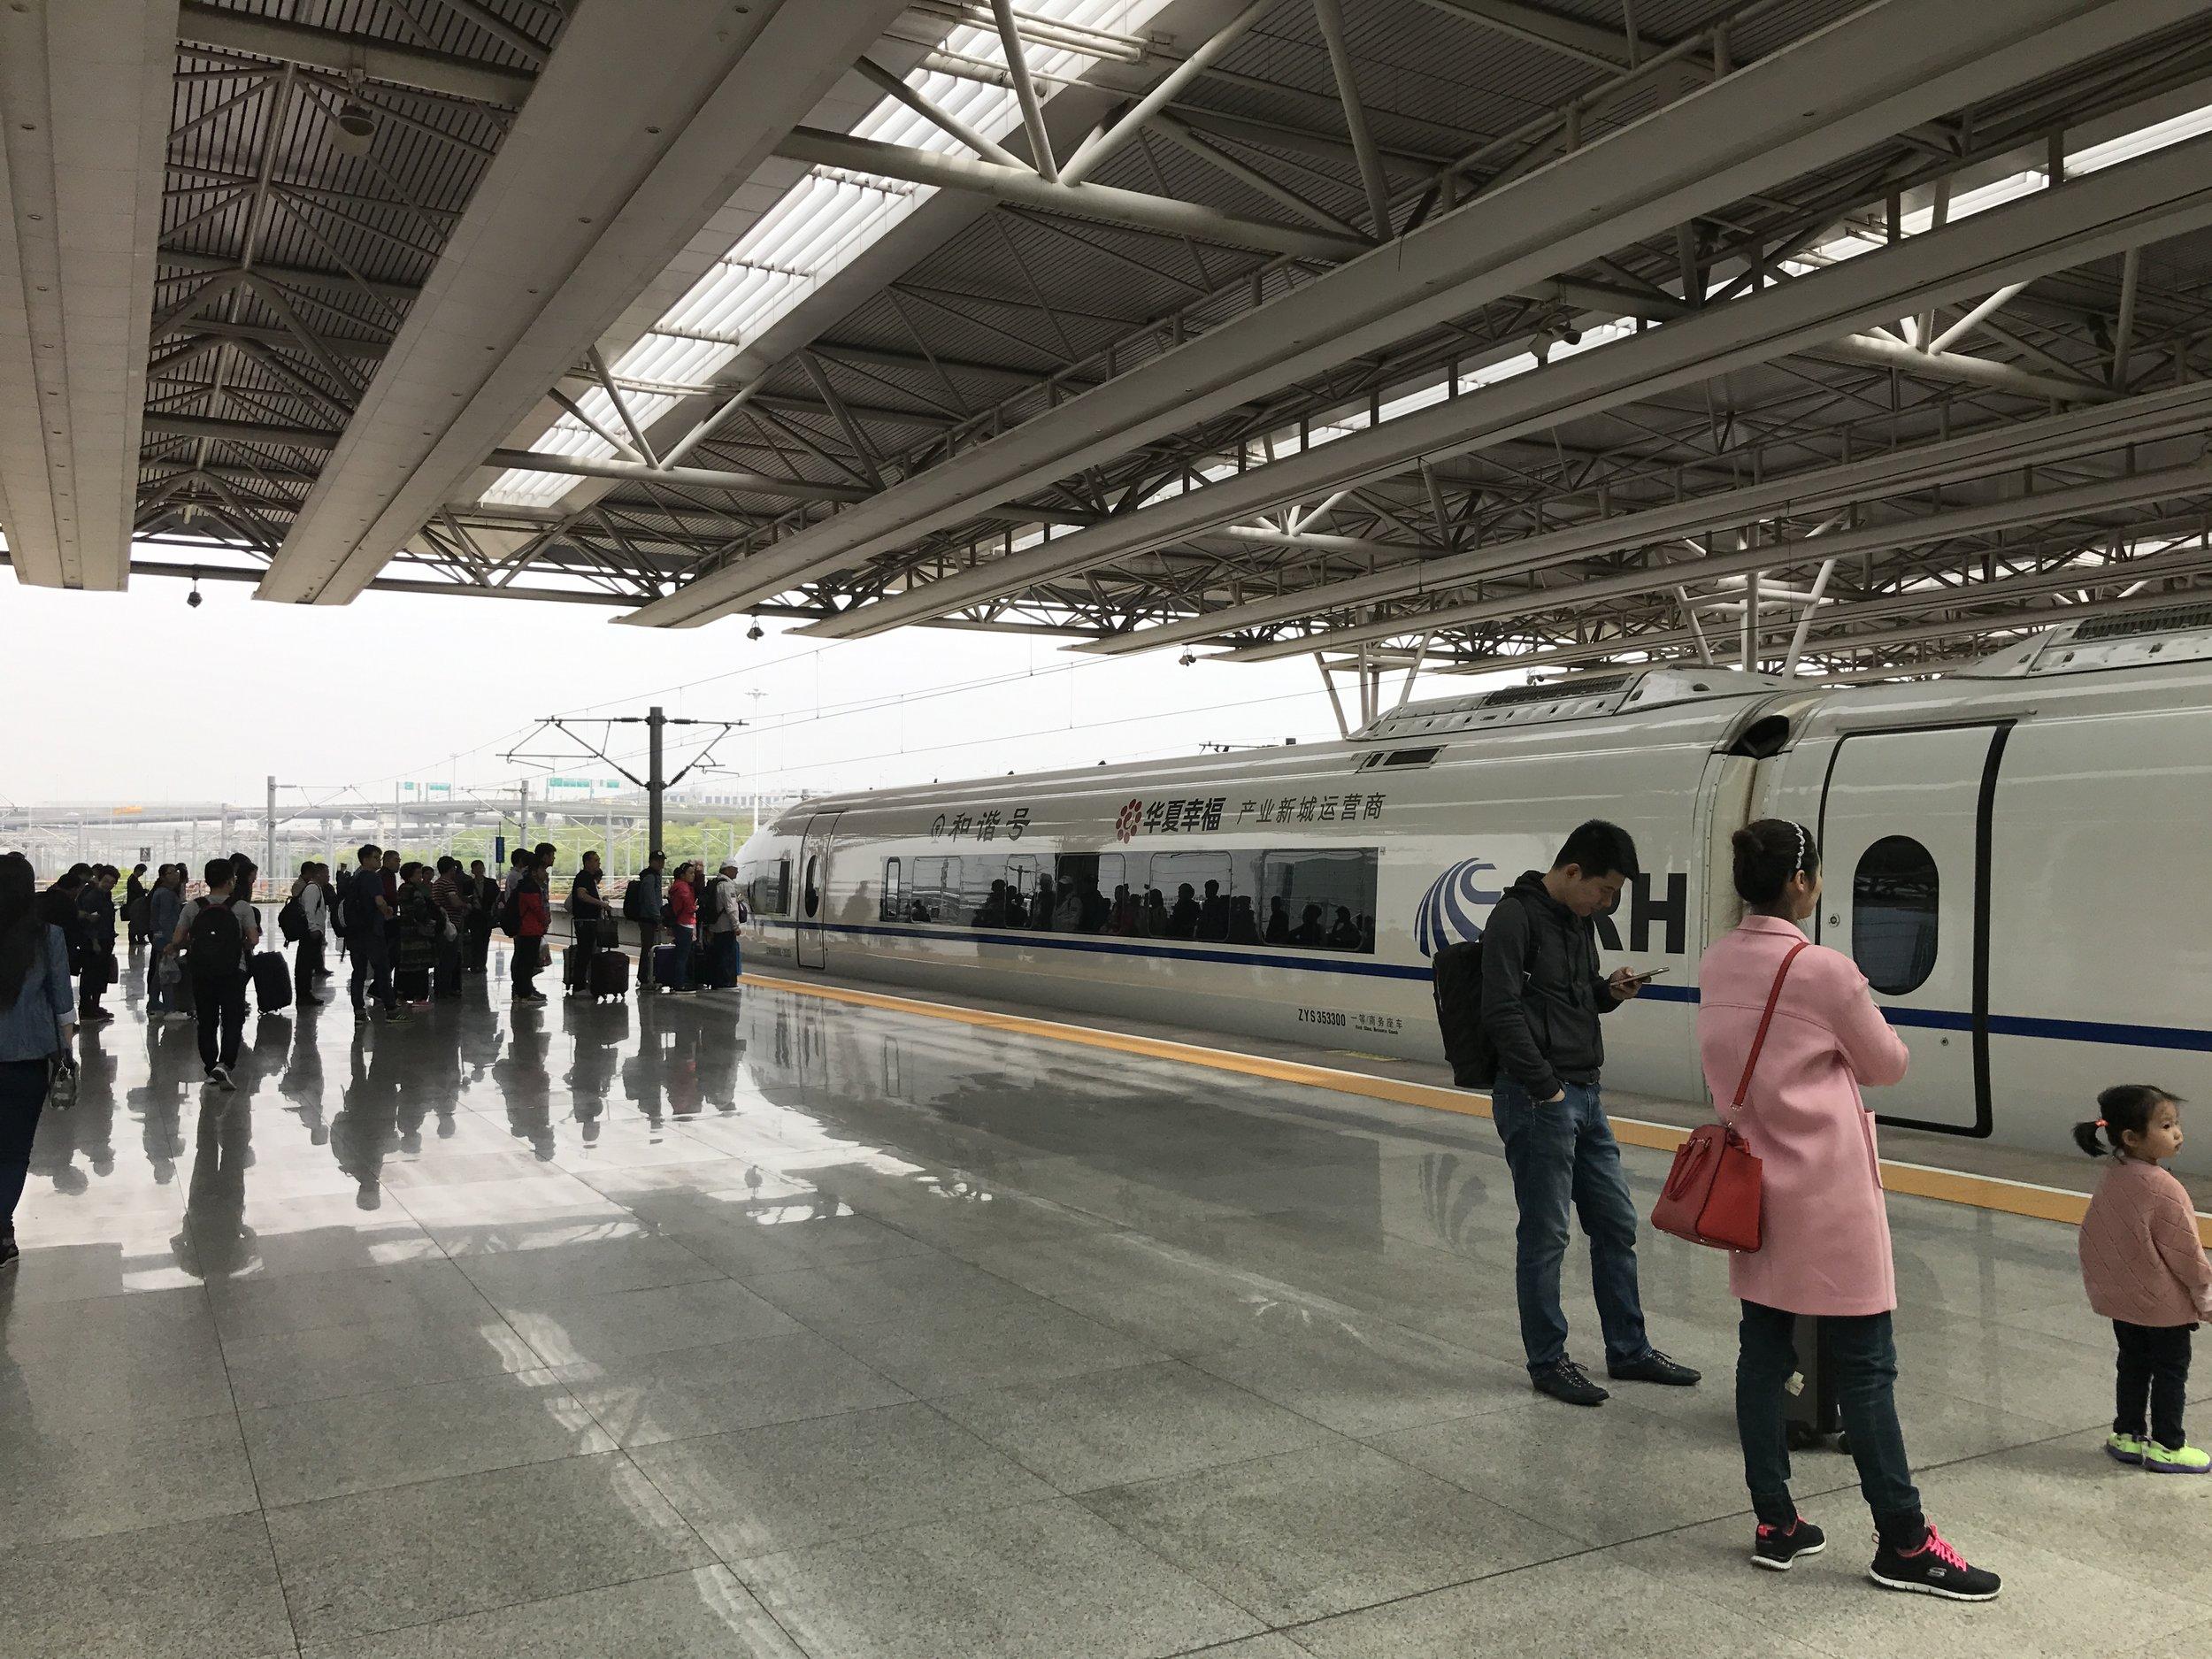 Bullet train, Shanghaihongqiao Railway Station